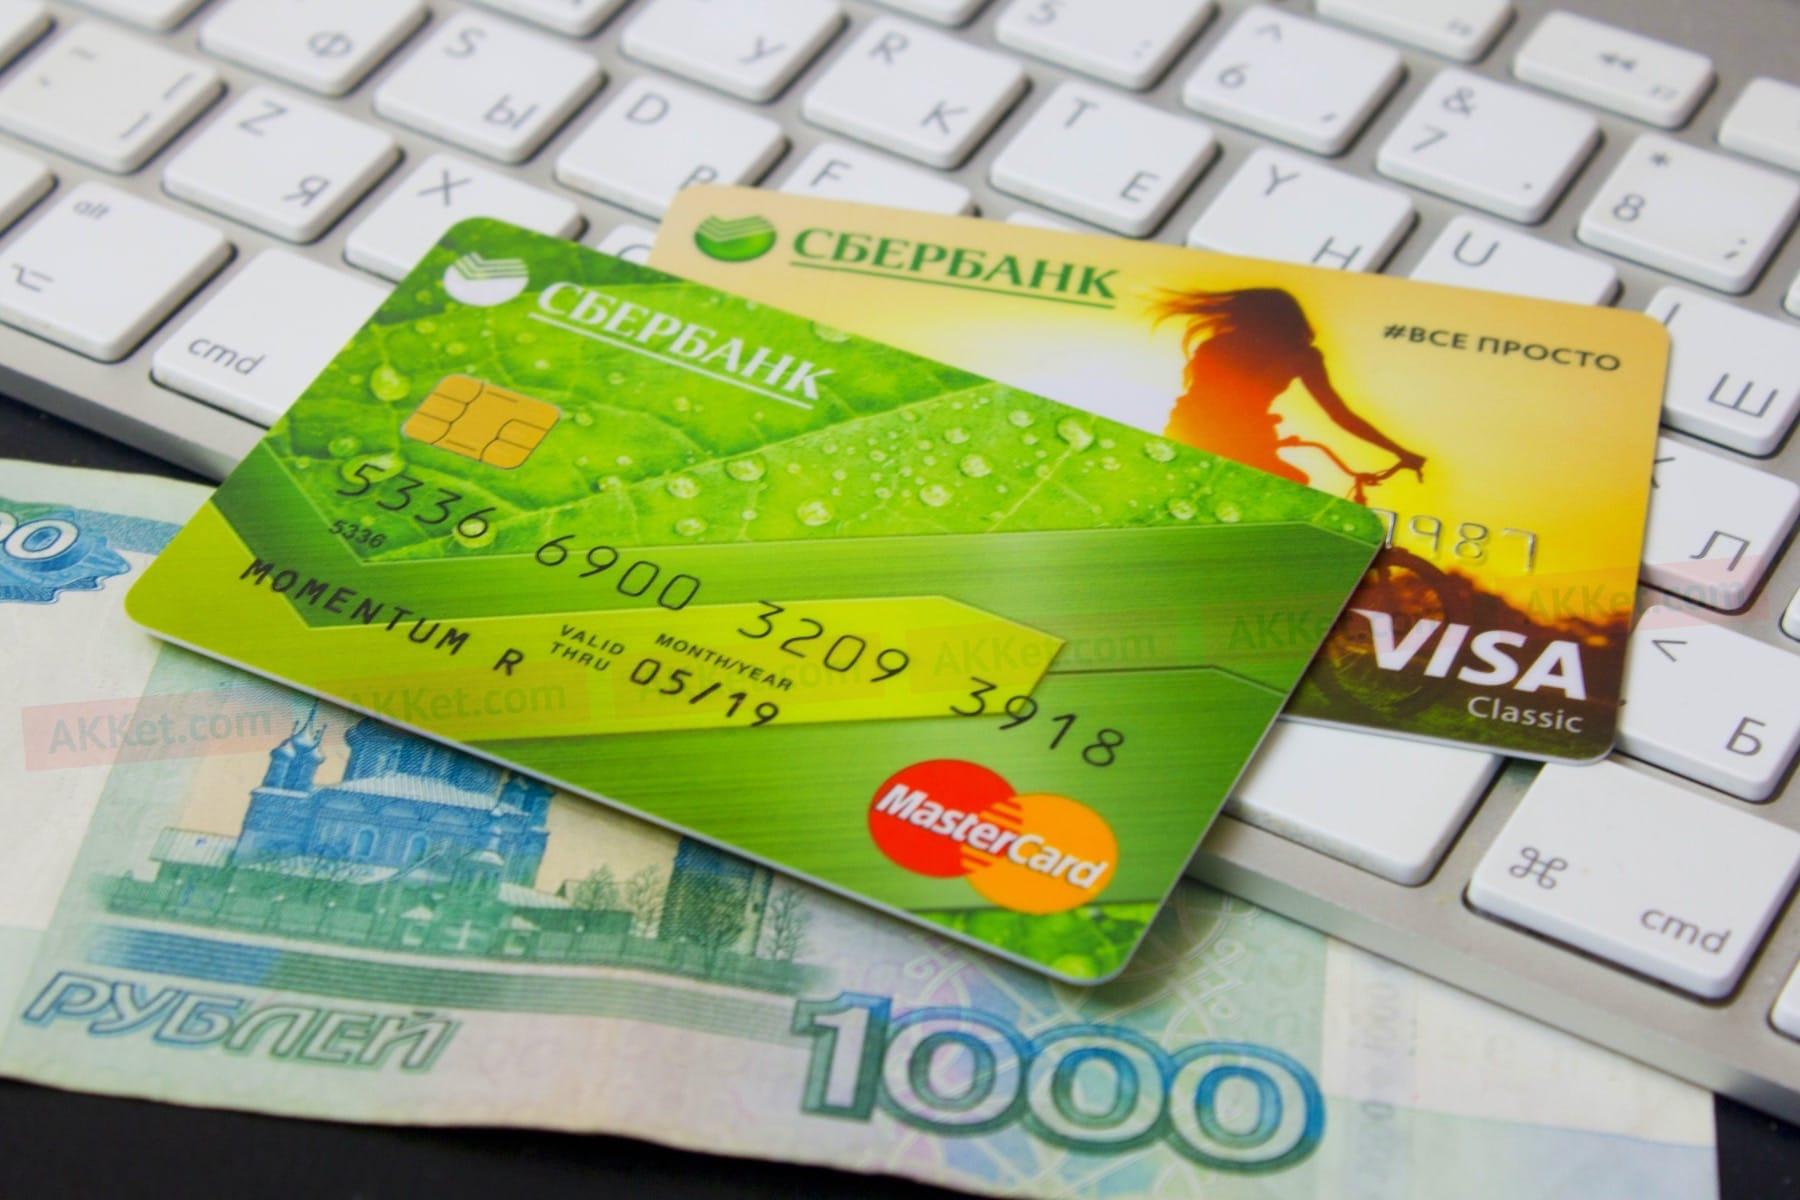 Изображение - Обзор мастер карт от сбербанка MasterCard-Bankovskie-karty-Sberbank-5-1